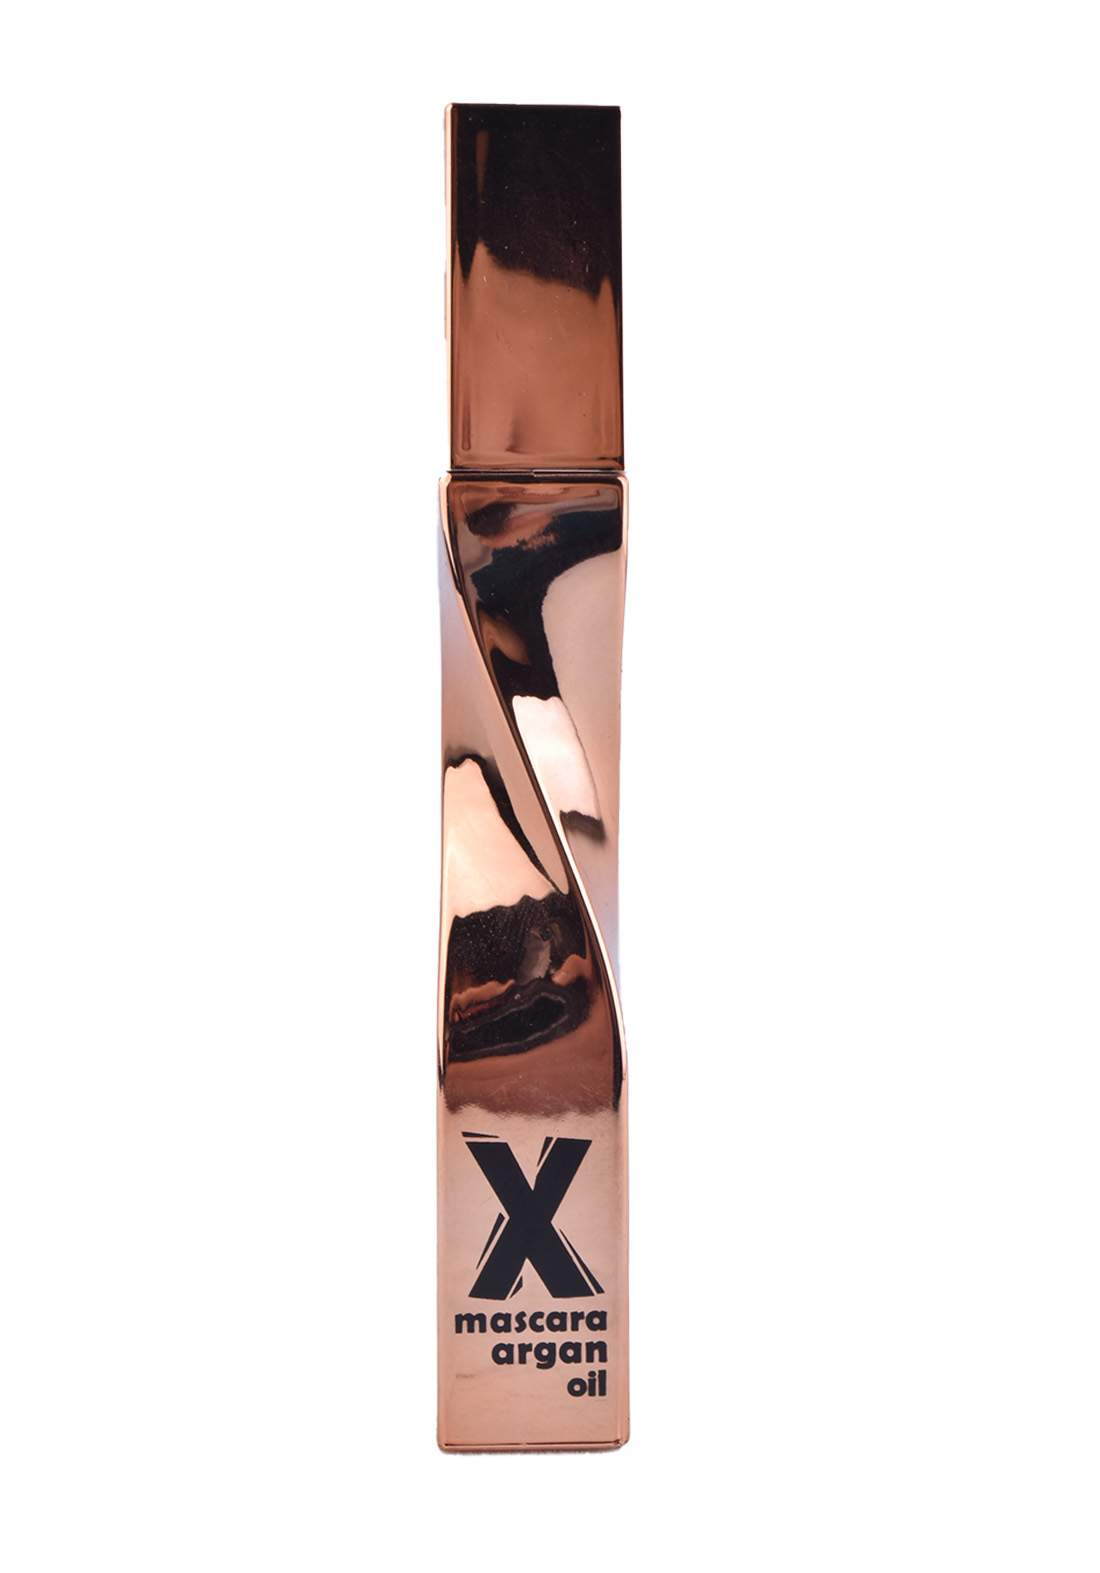 X Mascara with Argan Oil 10ml مسكارا